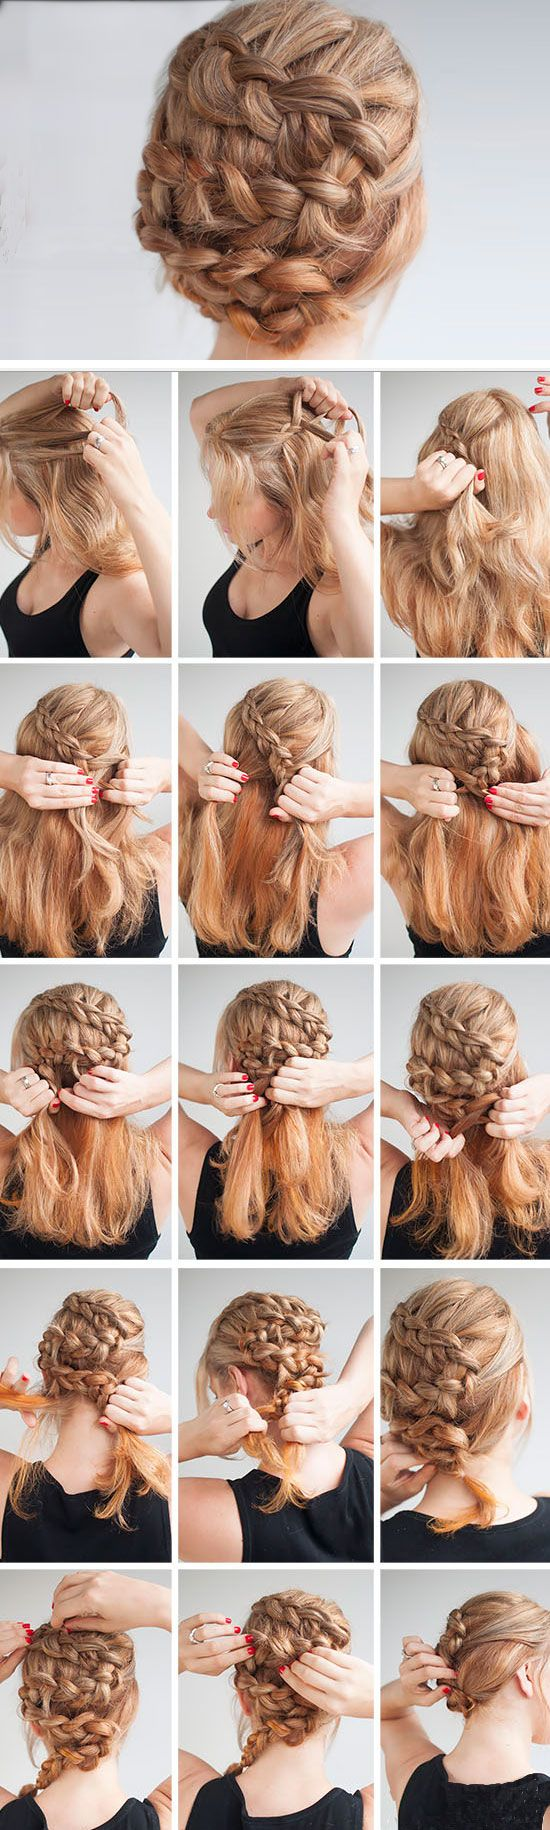 Twisting Braid | DIY Wedding Hairstyles for Medium Hair | Easy Bridesmaids Hairstyles for Long Hair